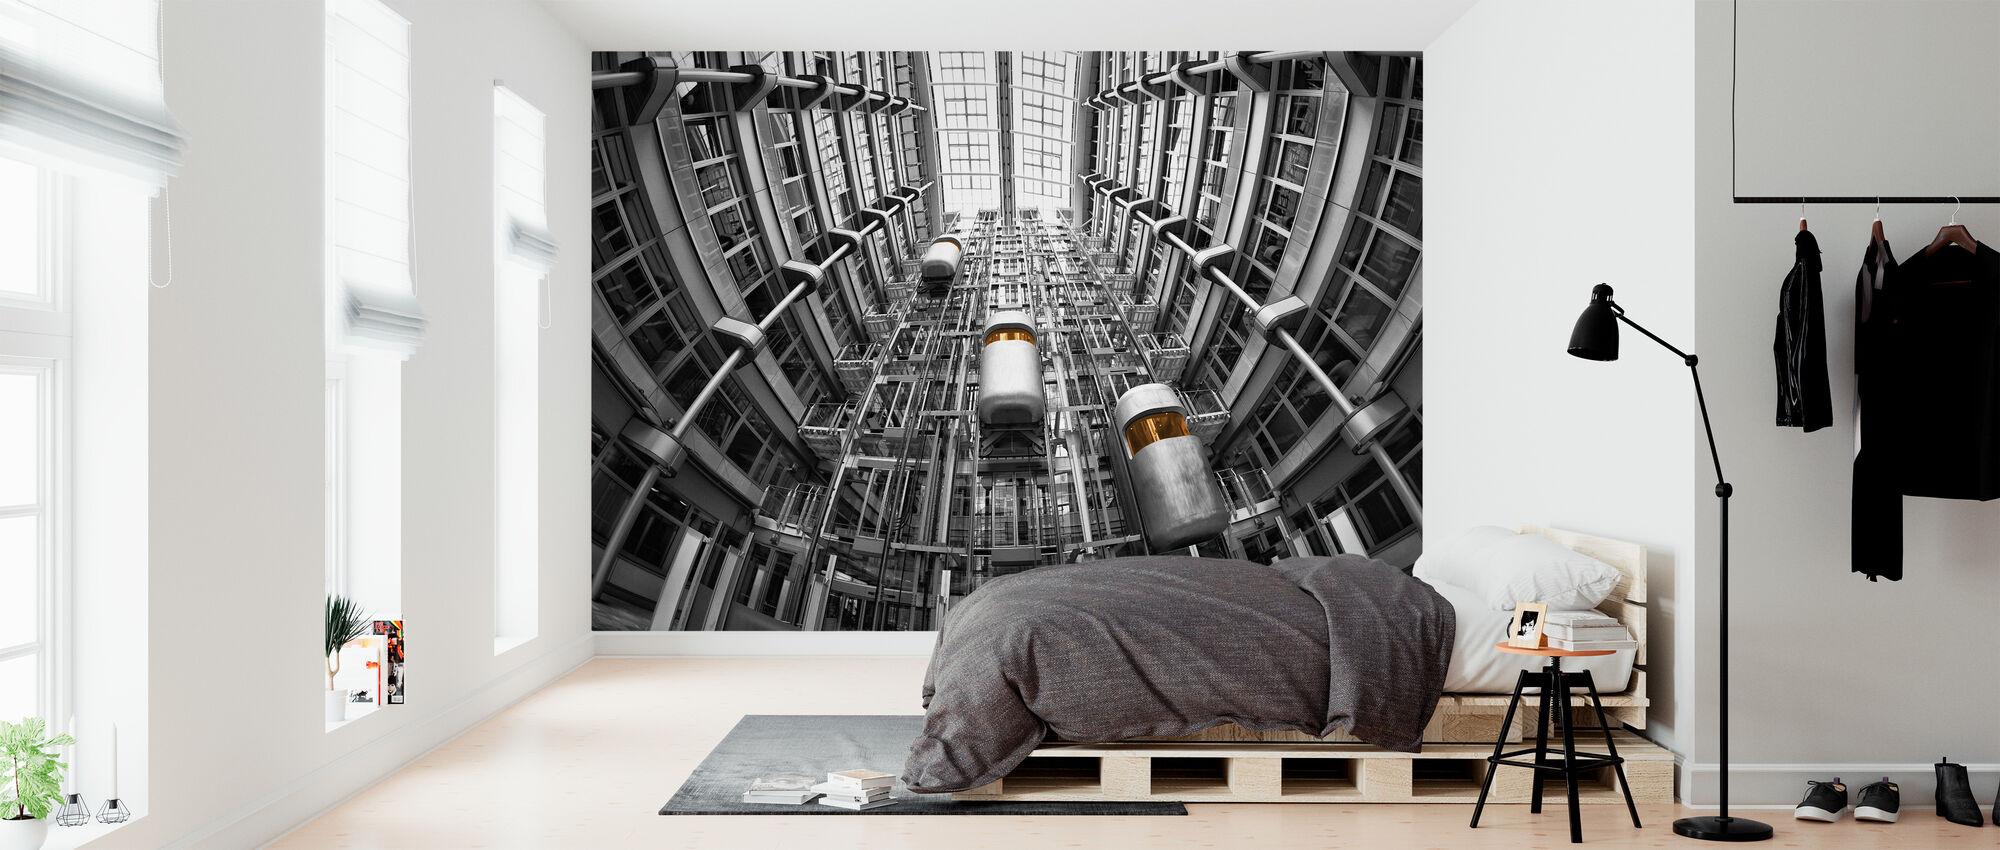 Lifts - Wallpaper - Bedroom